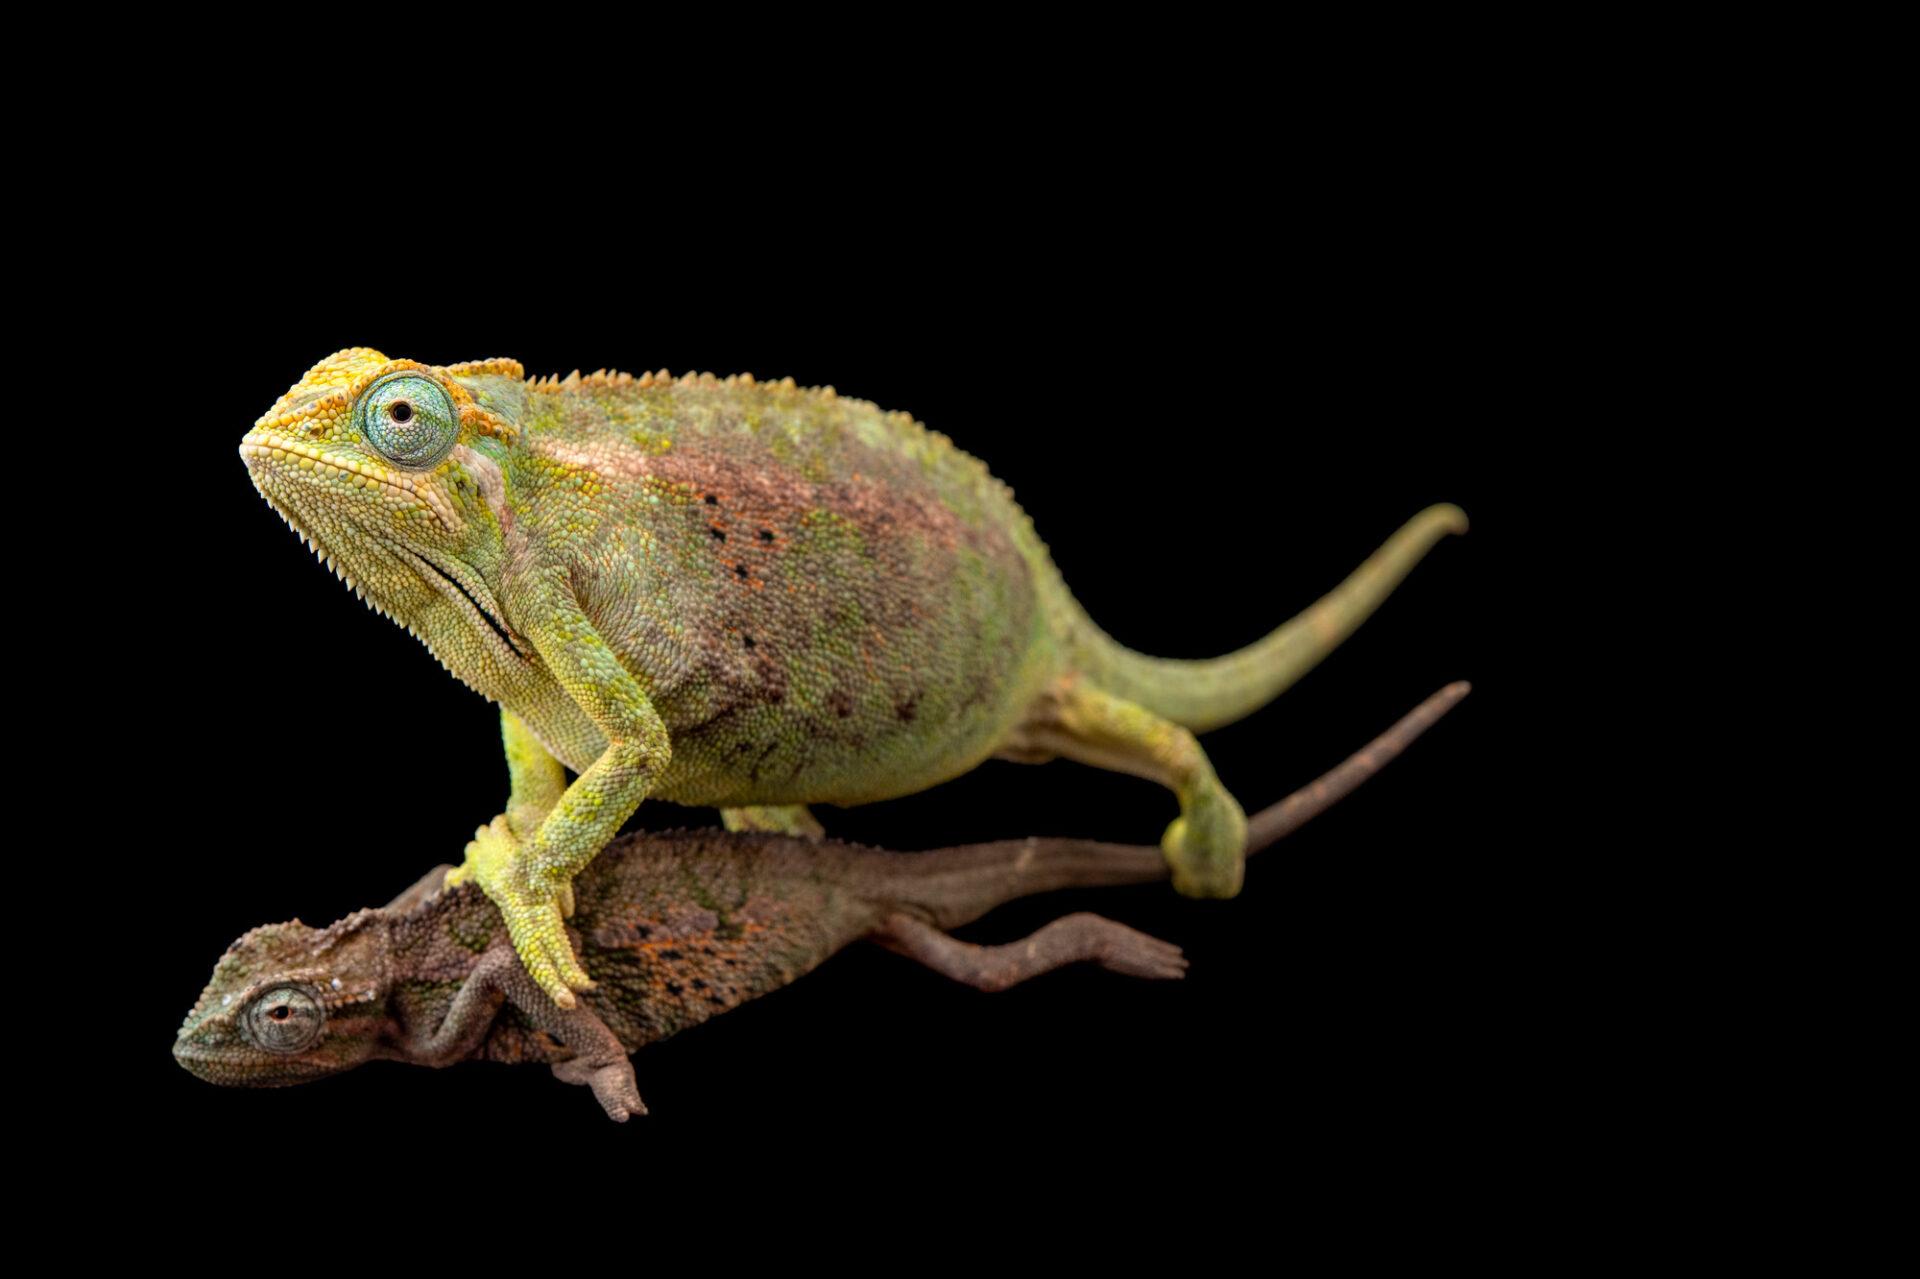 Photo: Two Elliot's groove-throated chameleons (Trioceros ellioti) at Zoopark Zajezd.